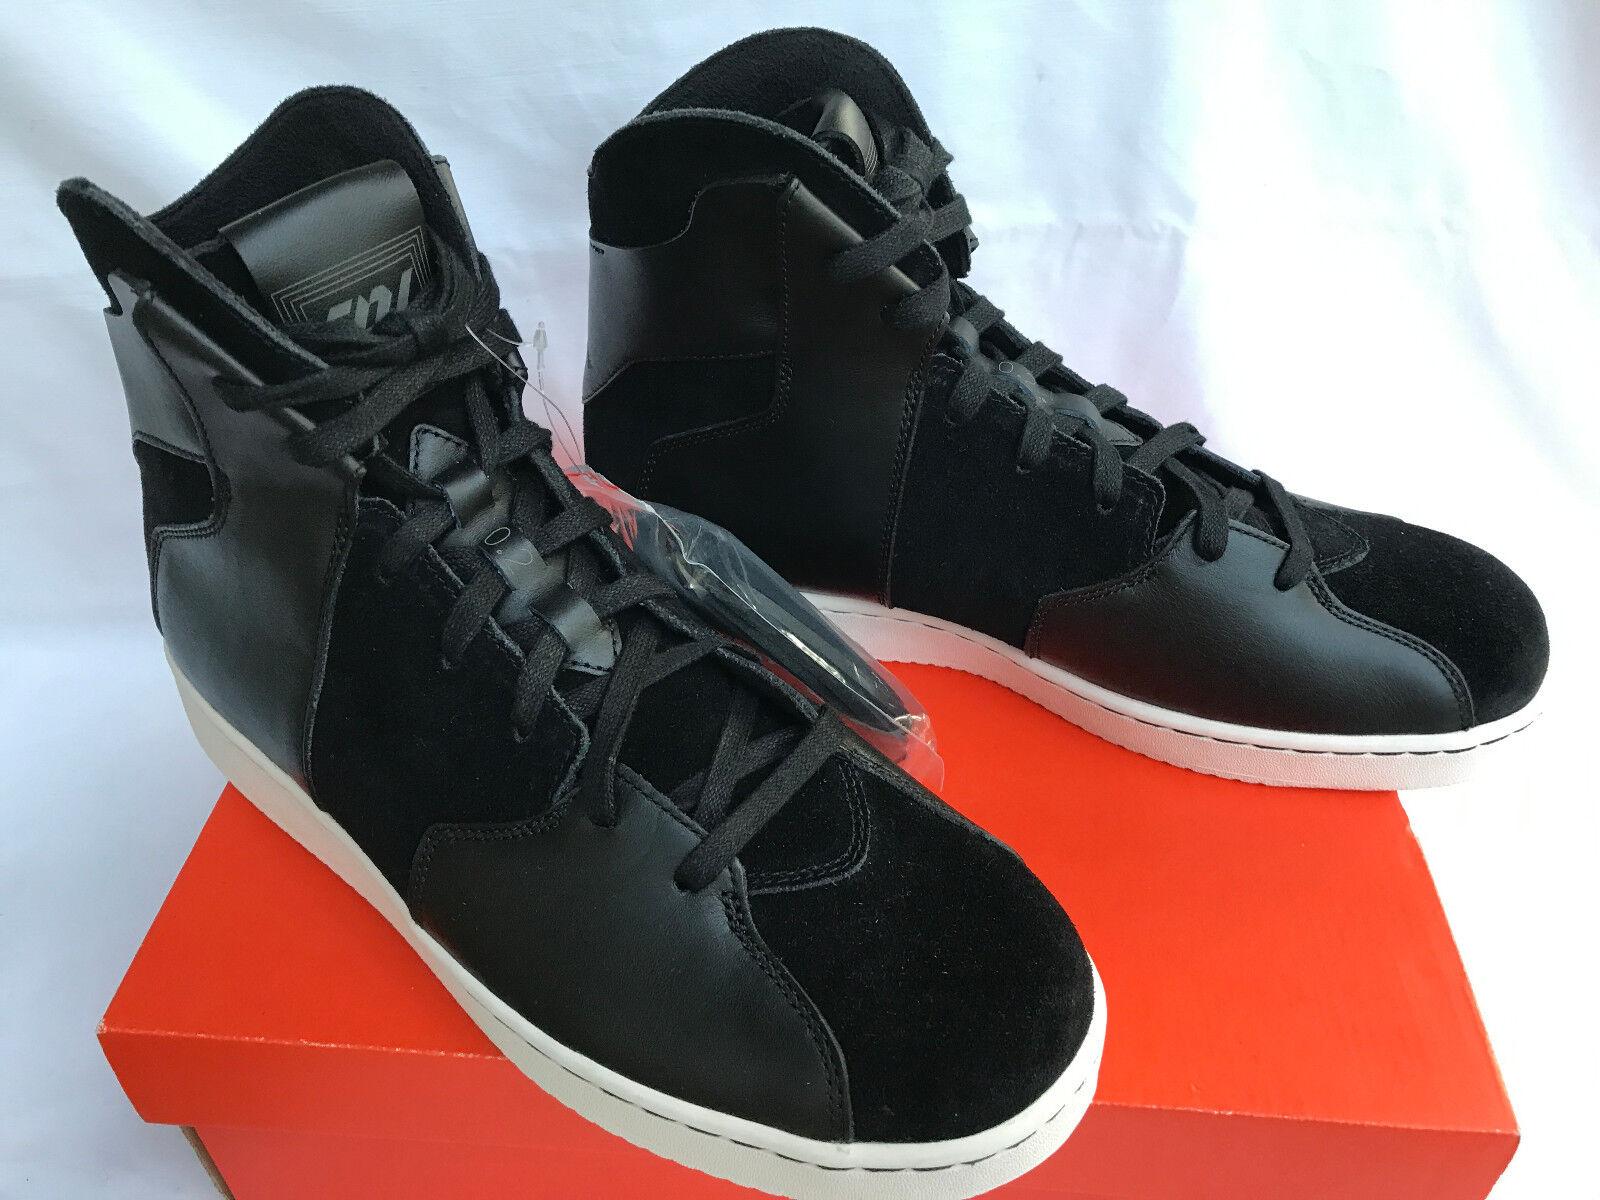 Jordan Westbrook 0.2 Black 854563-004 Why Not Russell Basketball shoes Men's 11